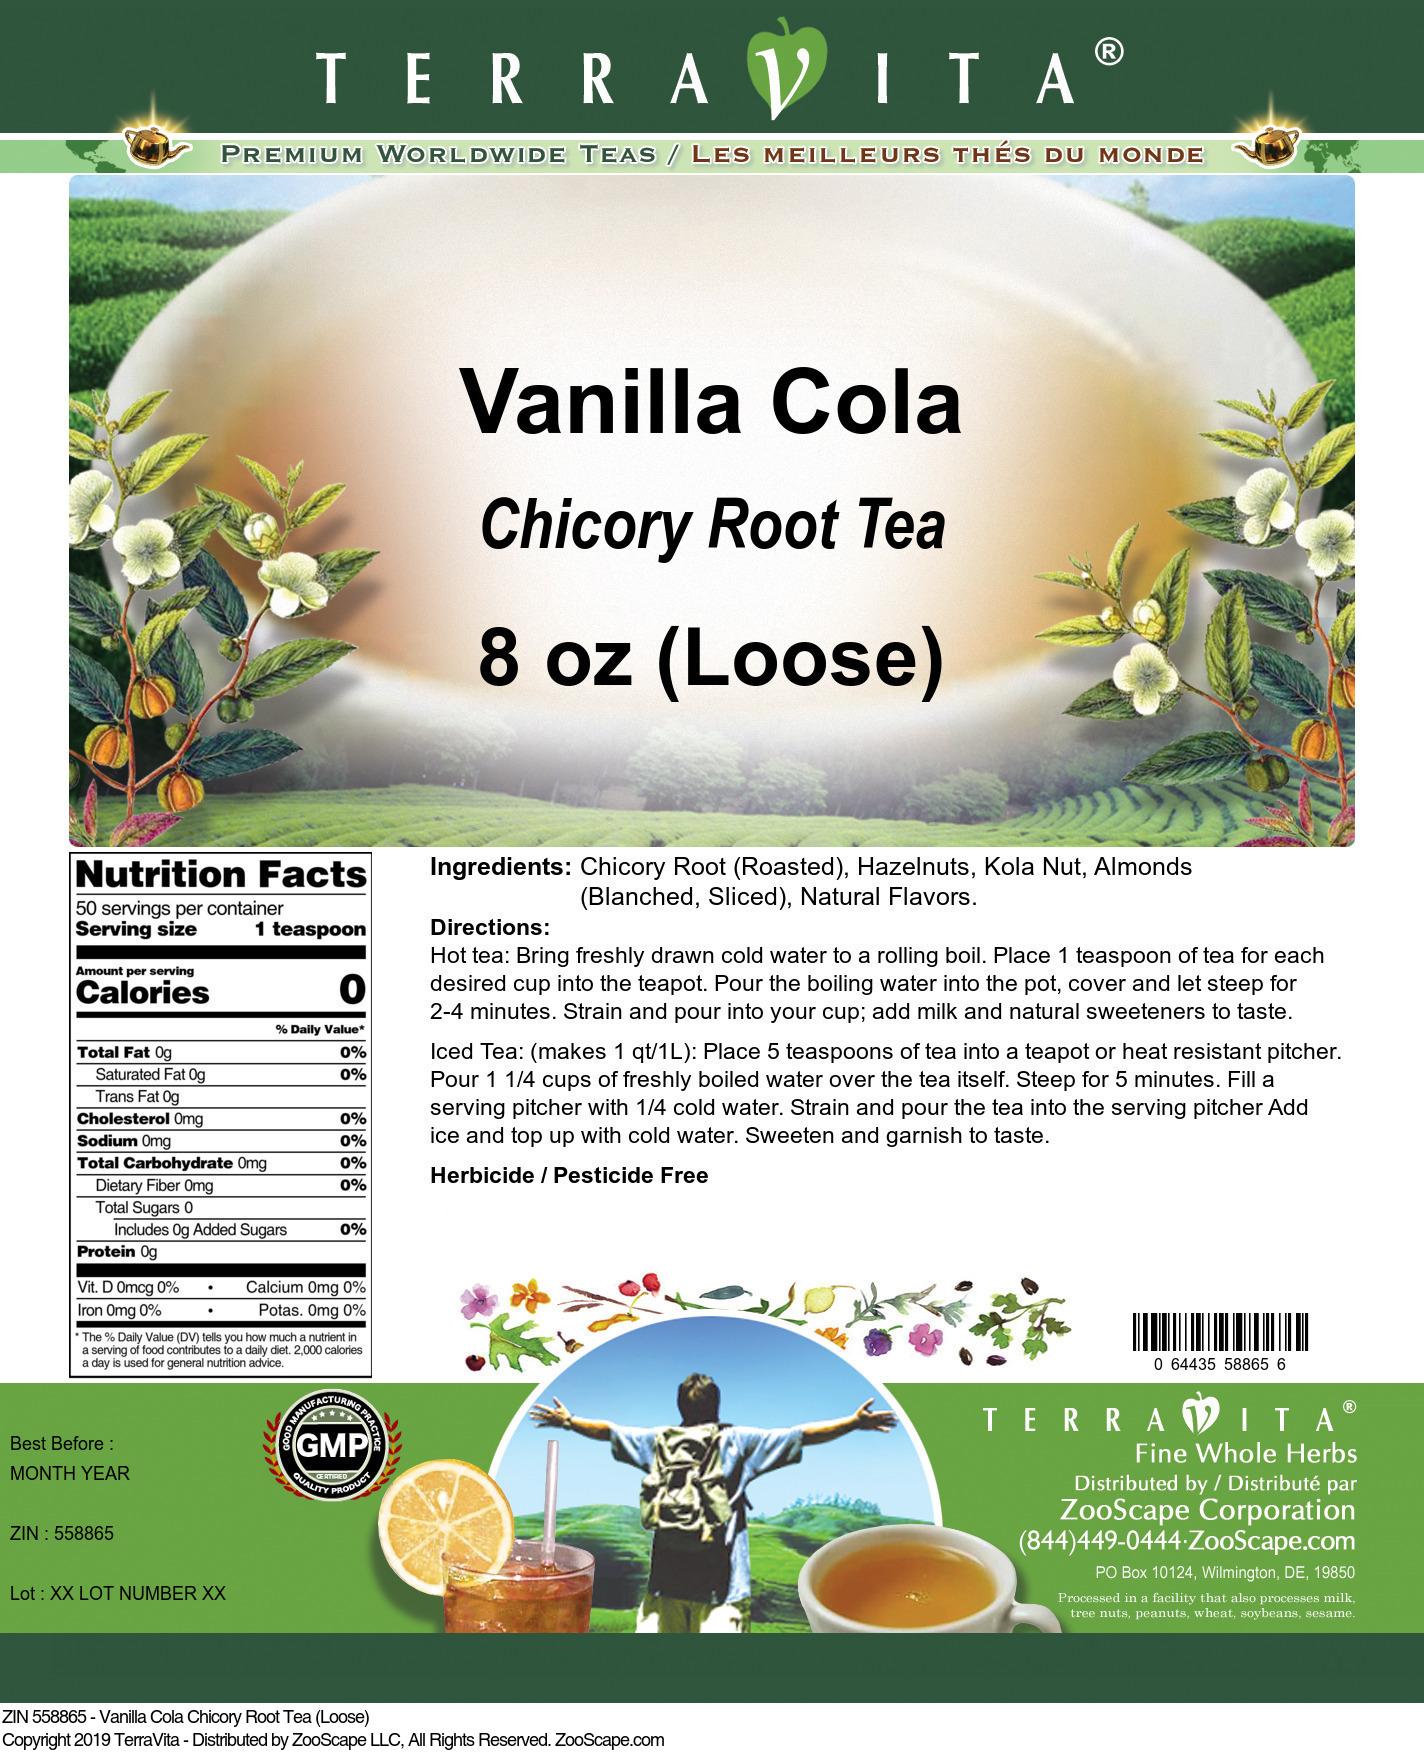 Vanilla Cola Chicory Root